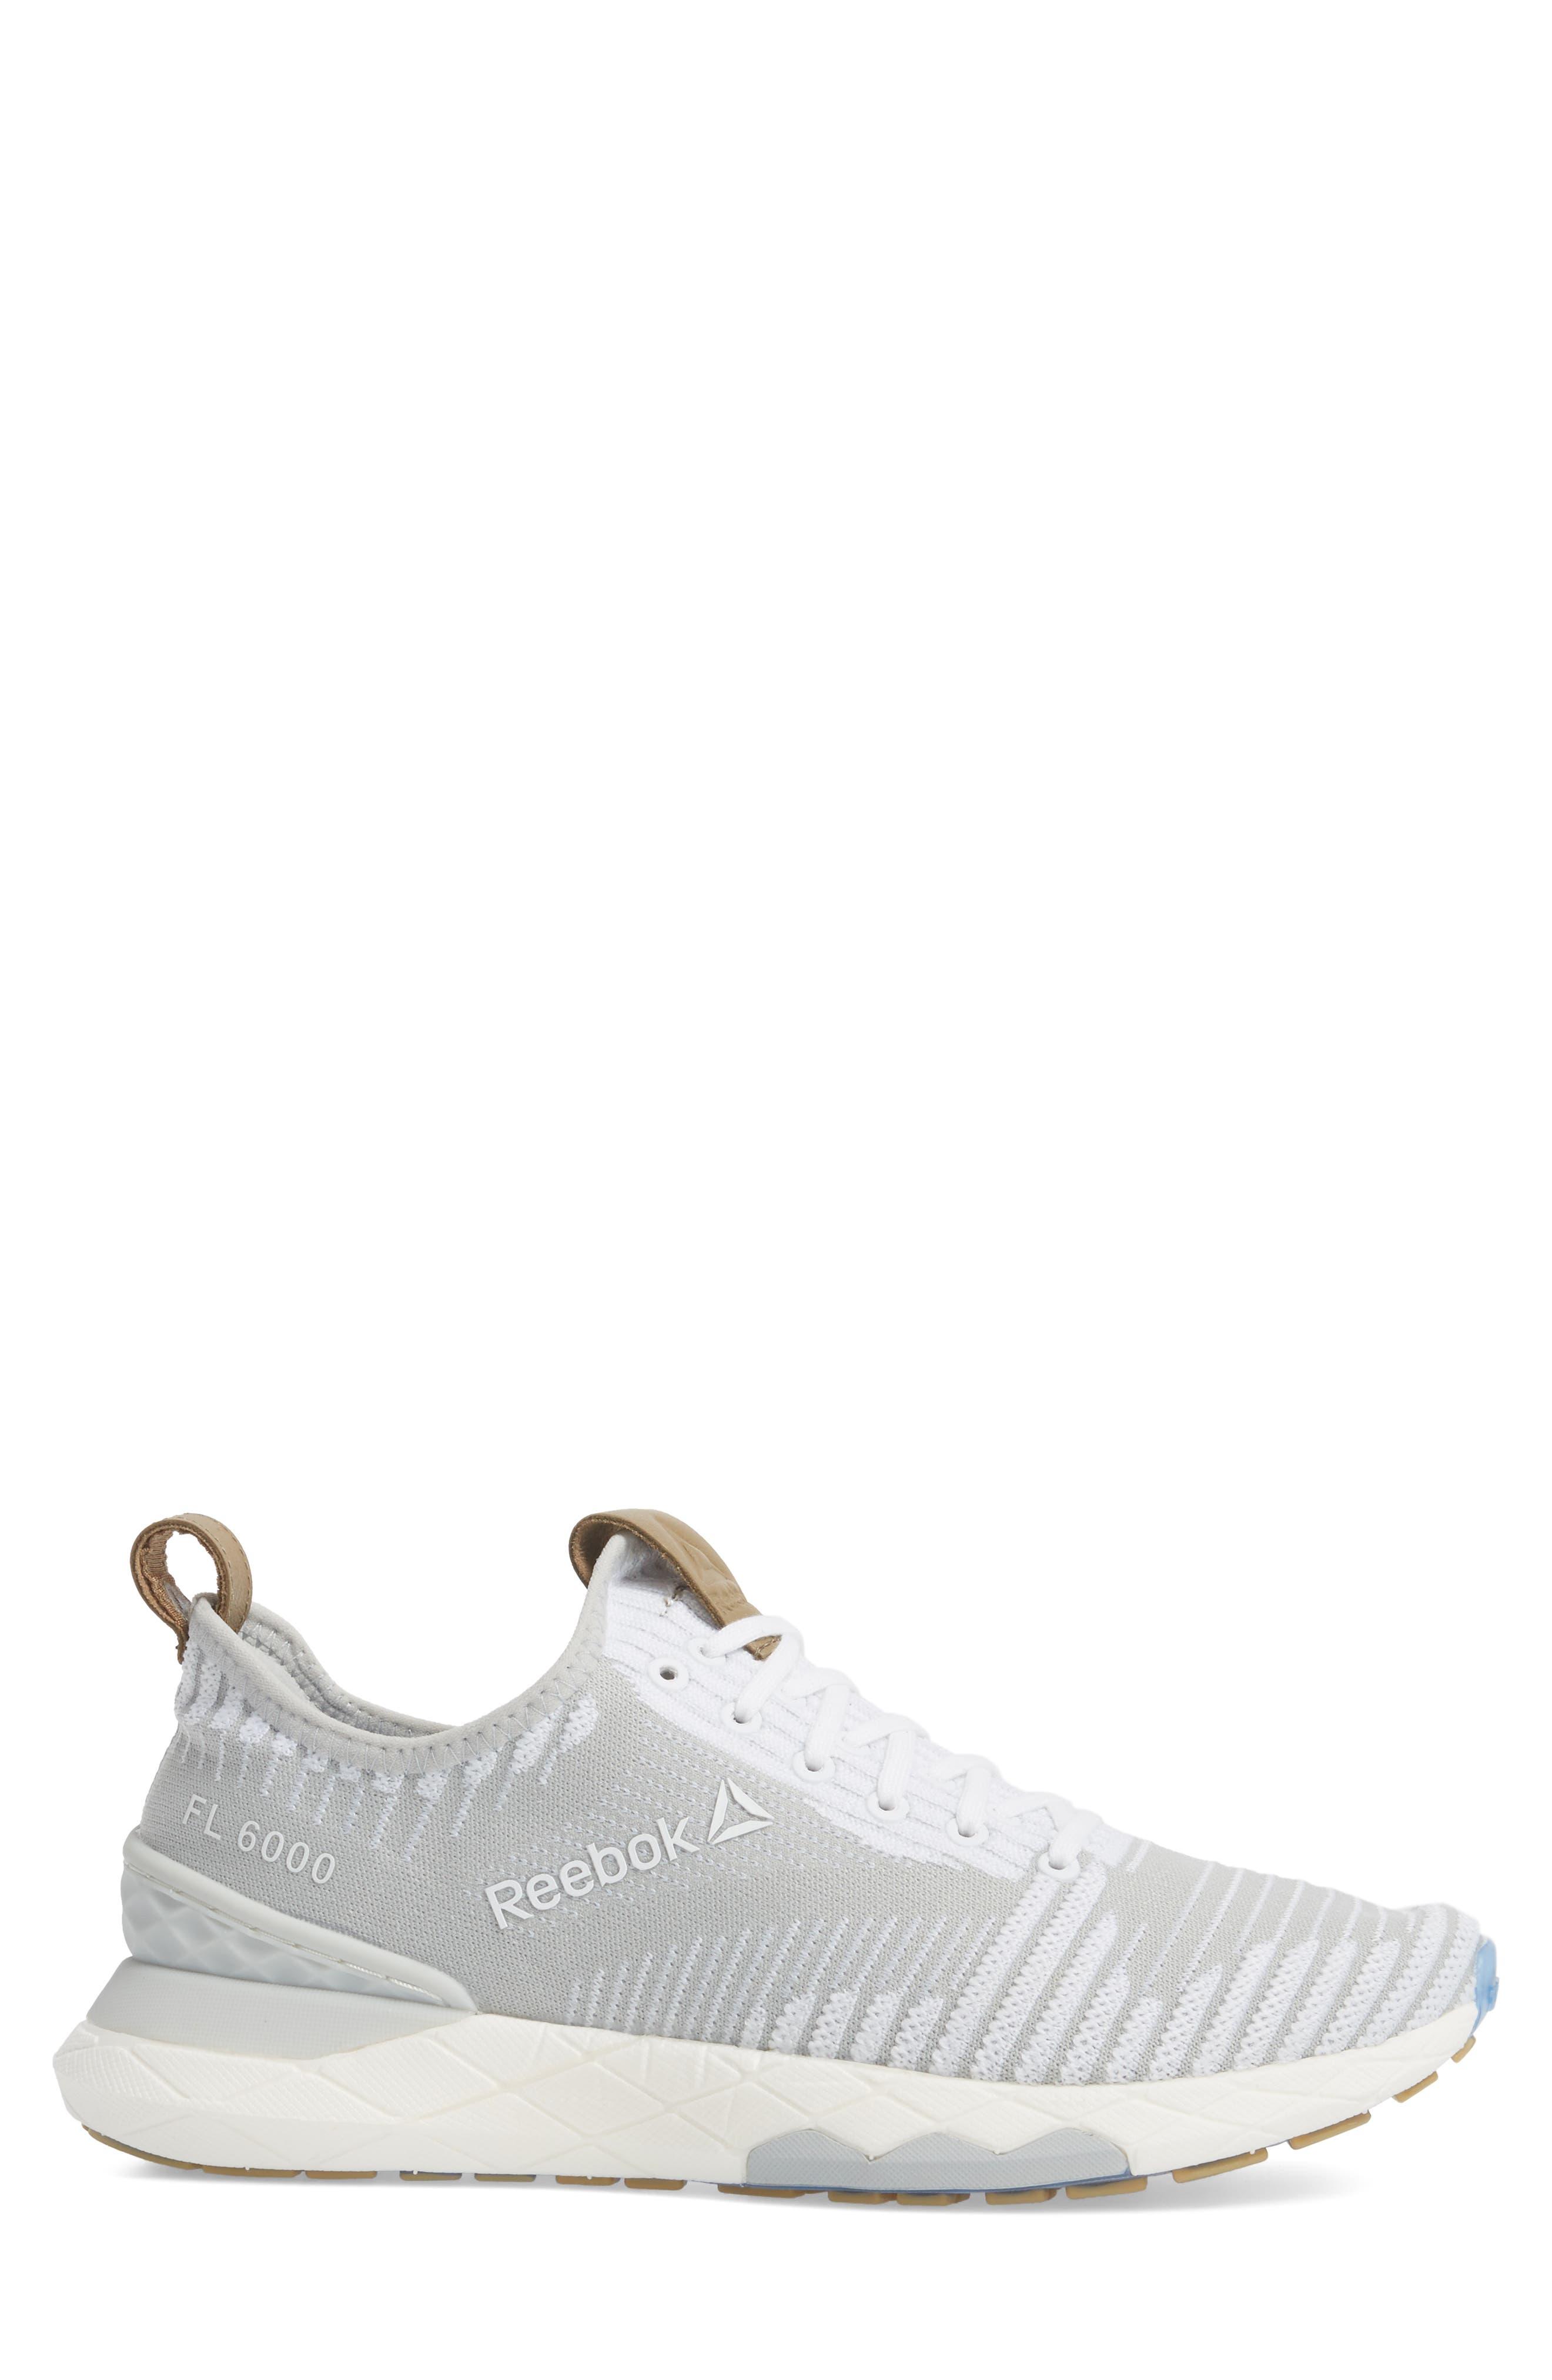 Floatride Run 6000 Running Shoe,                             Alternate thumbnail 15, color,